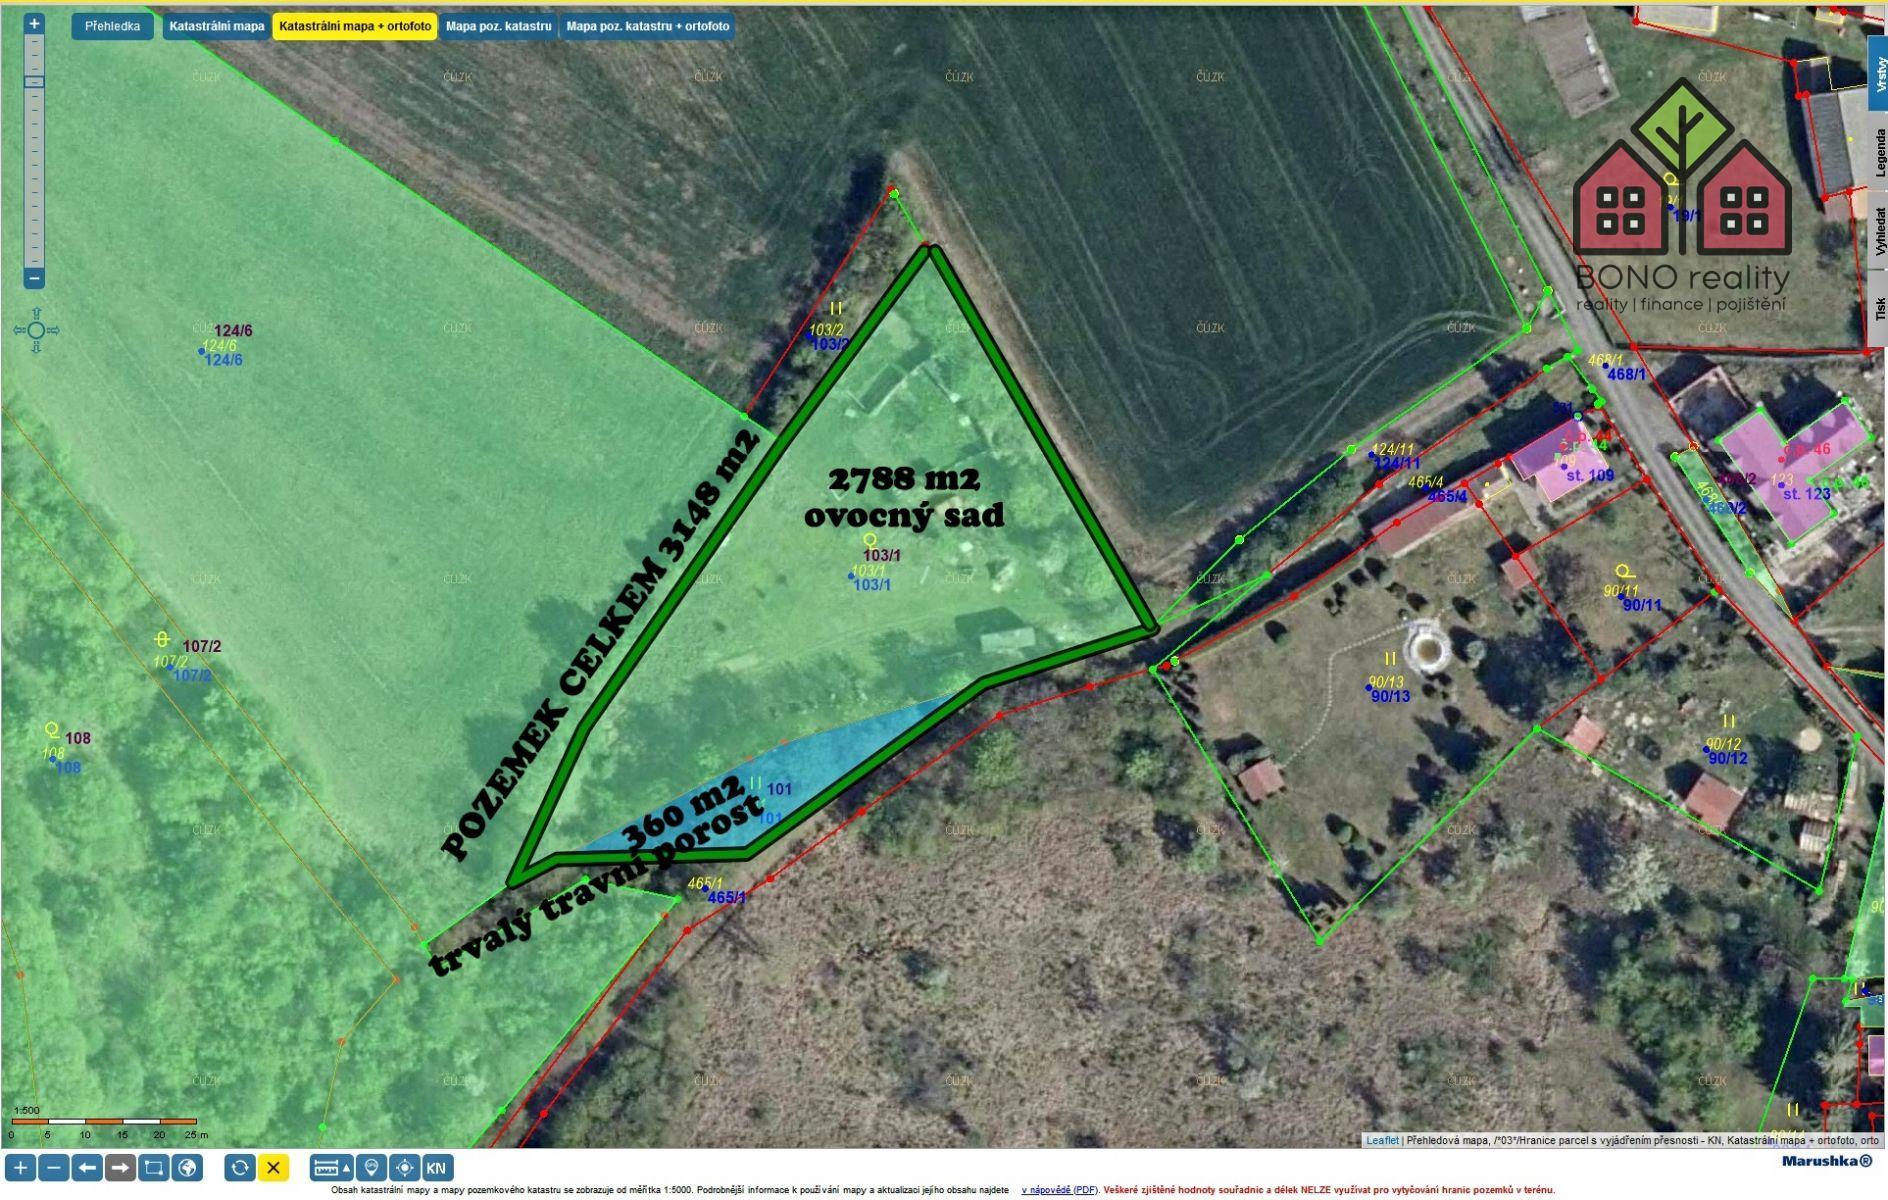 Pozemek 3148 m2, ovocný sad, chov ovcí, rekreace, okres Litoměřice, k.ú. Boreč